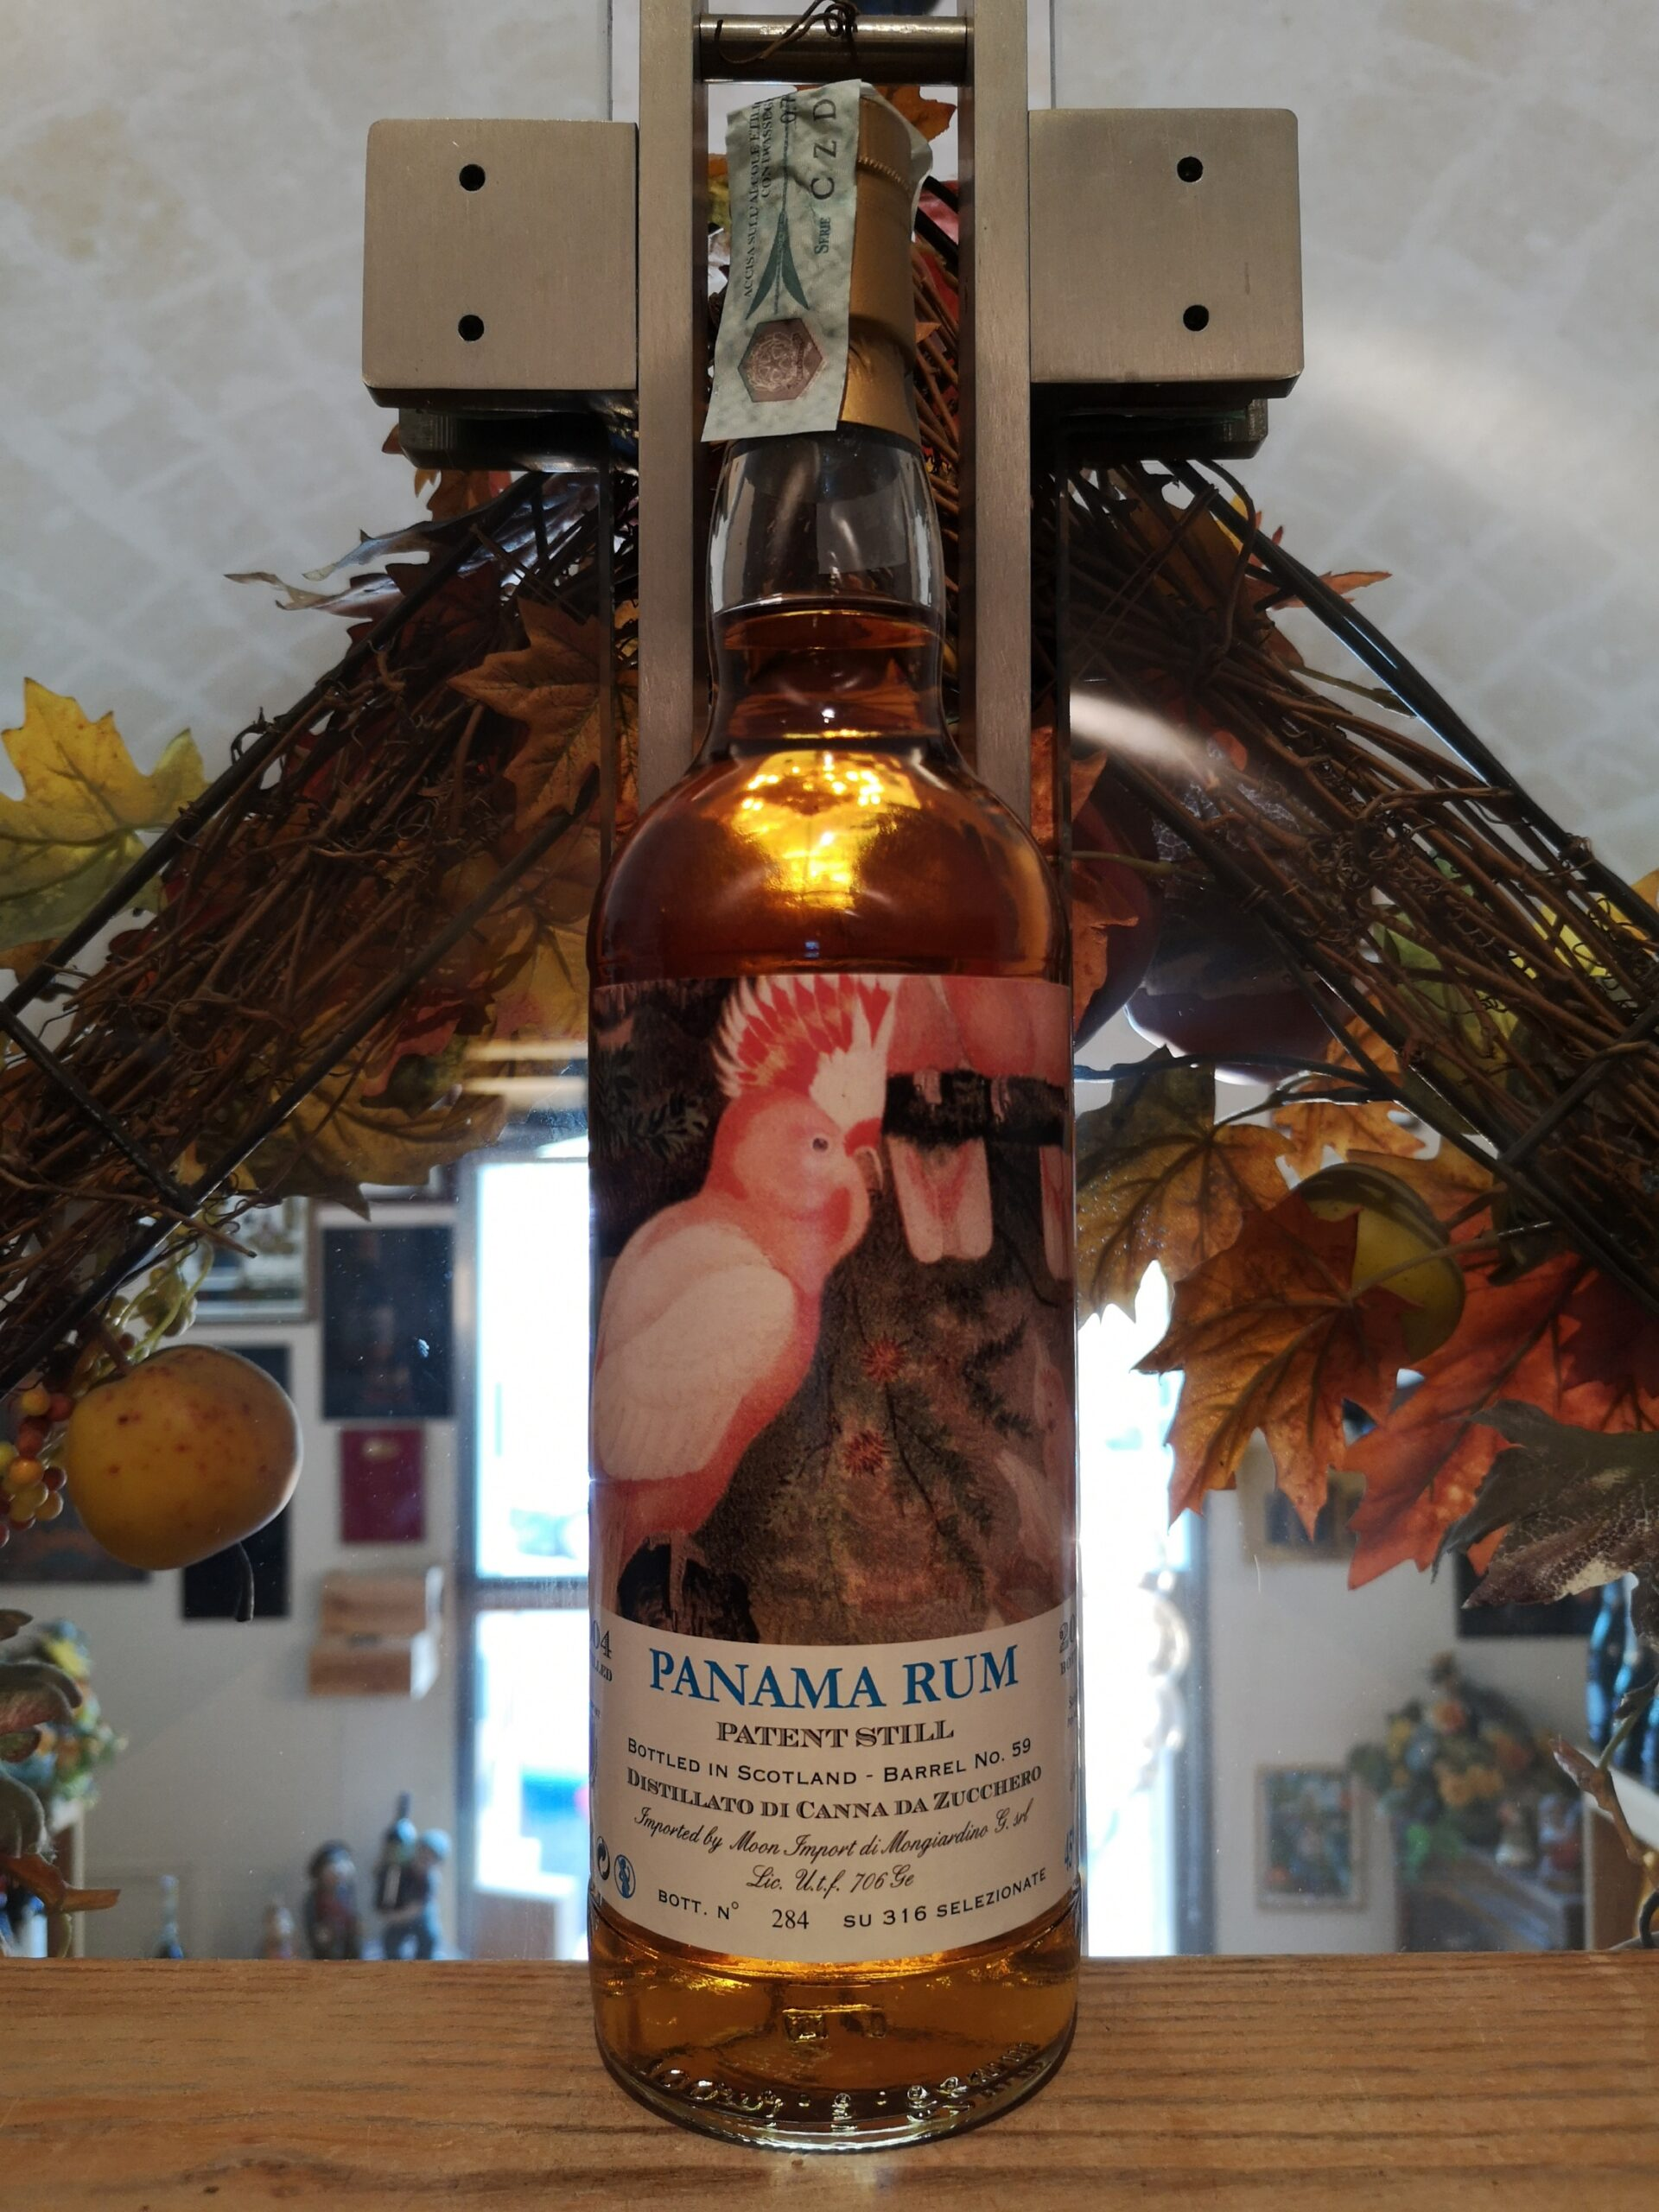 Pappagalli Rum Panama 2004 15 YO Moon Import